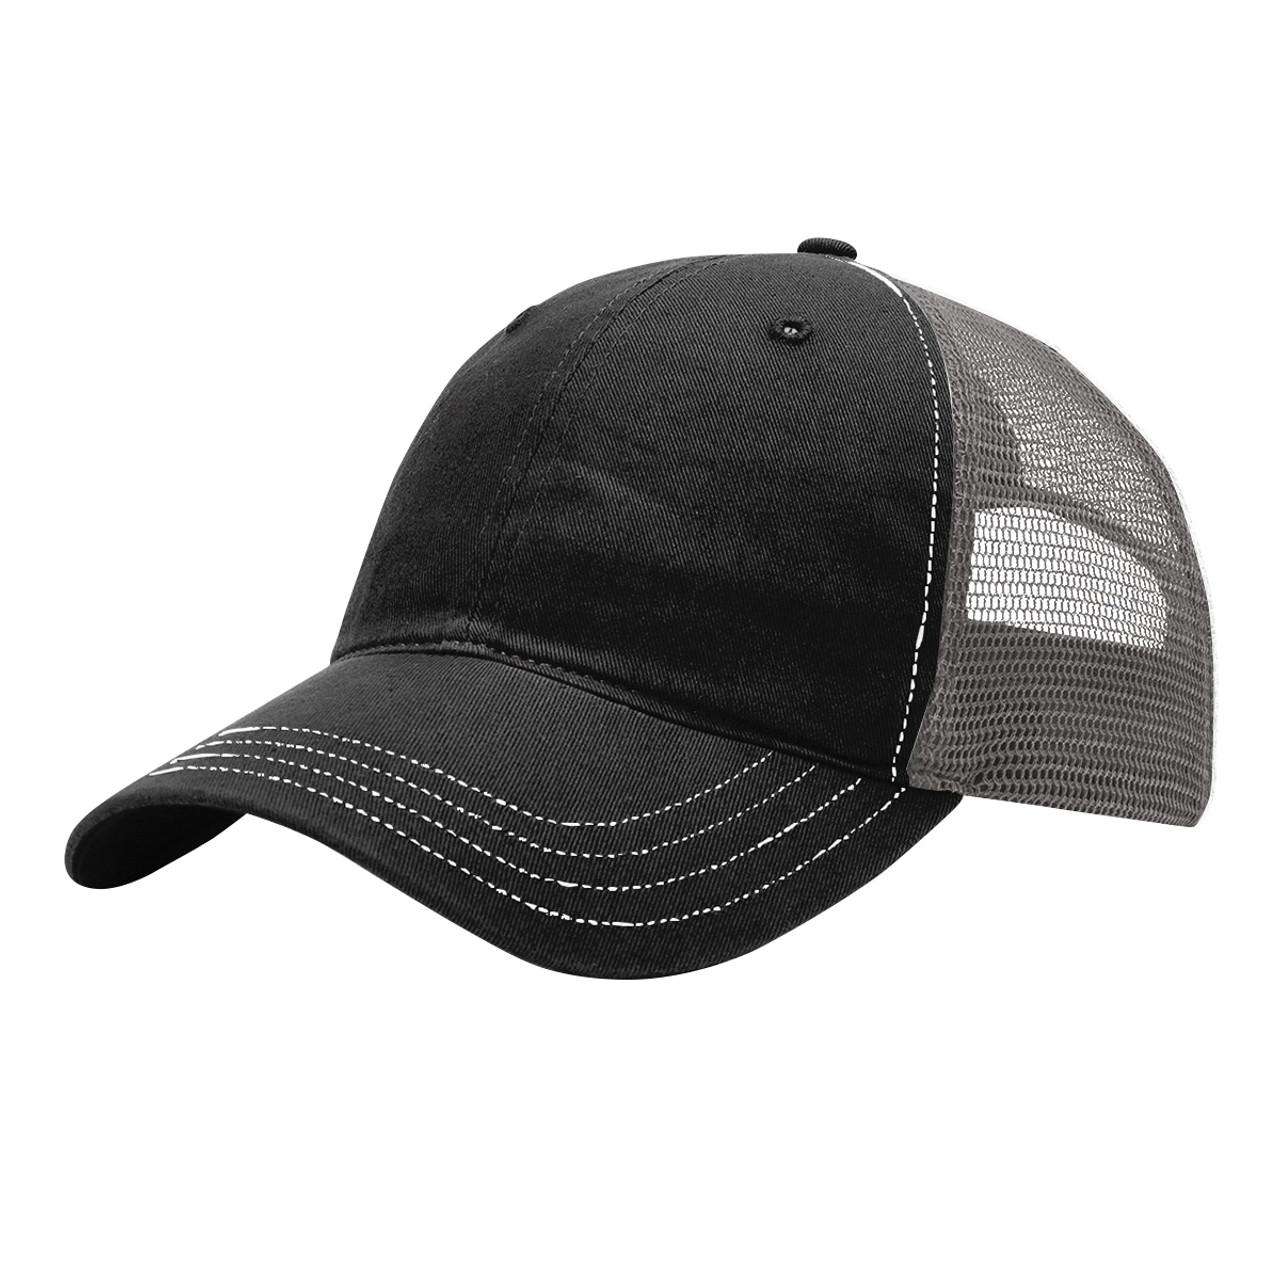 111 Richardson Washed Trucker Hat | T-shirt.ca